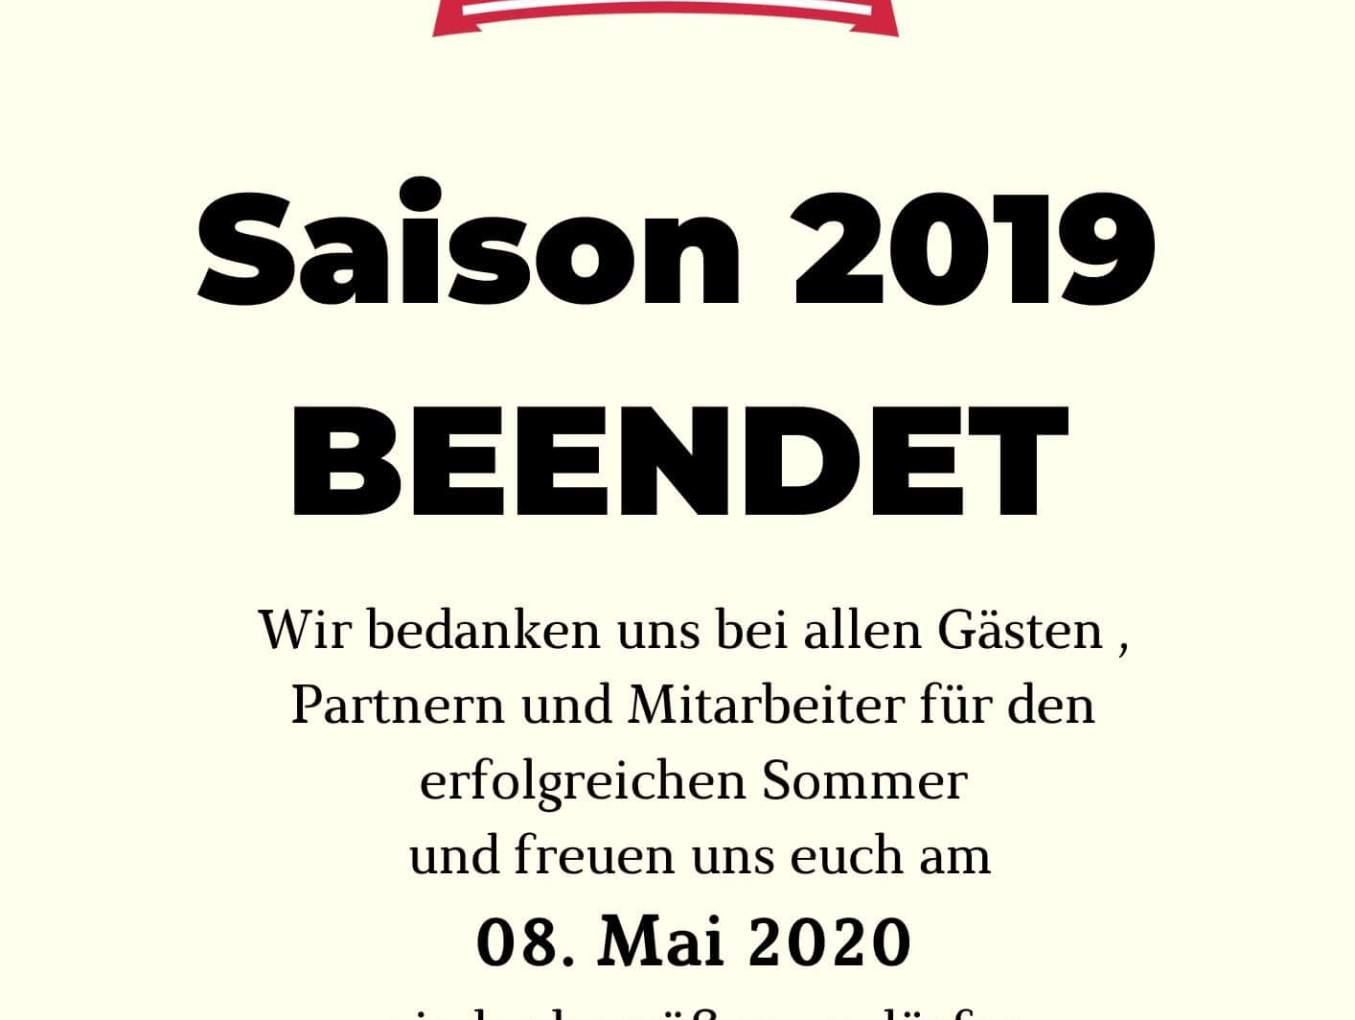 Saison 2019 beendet